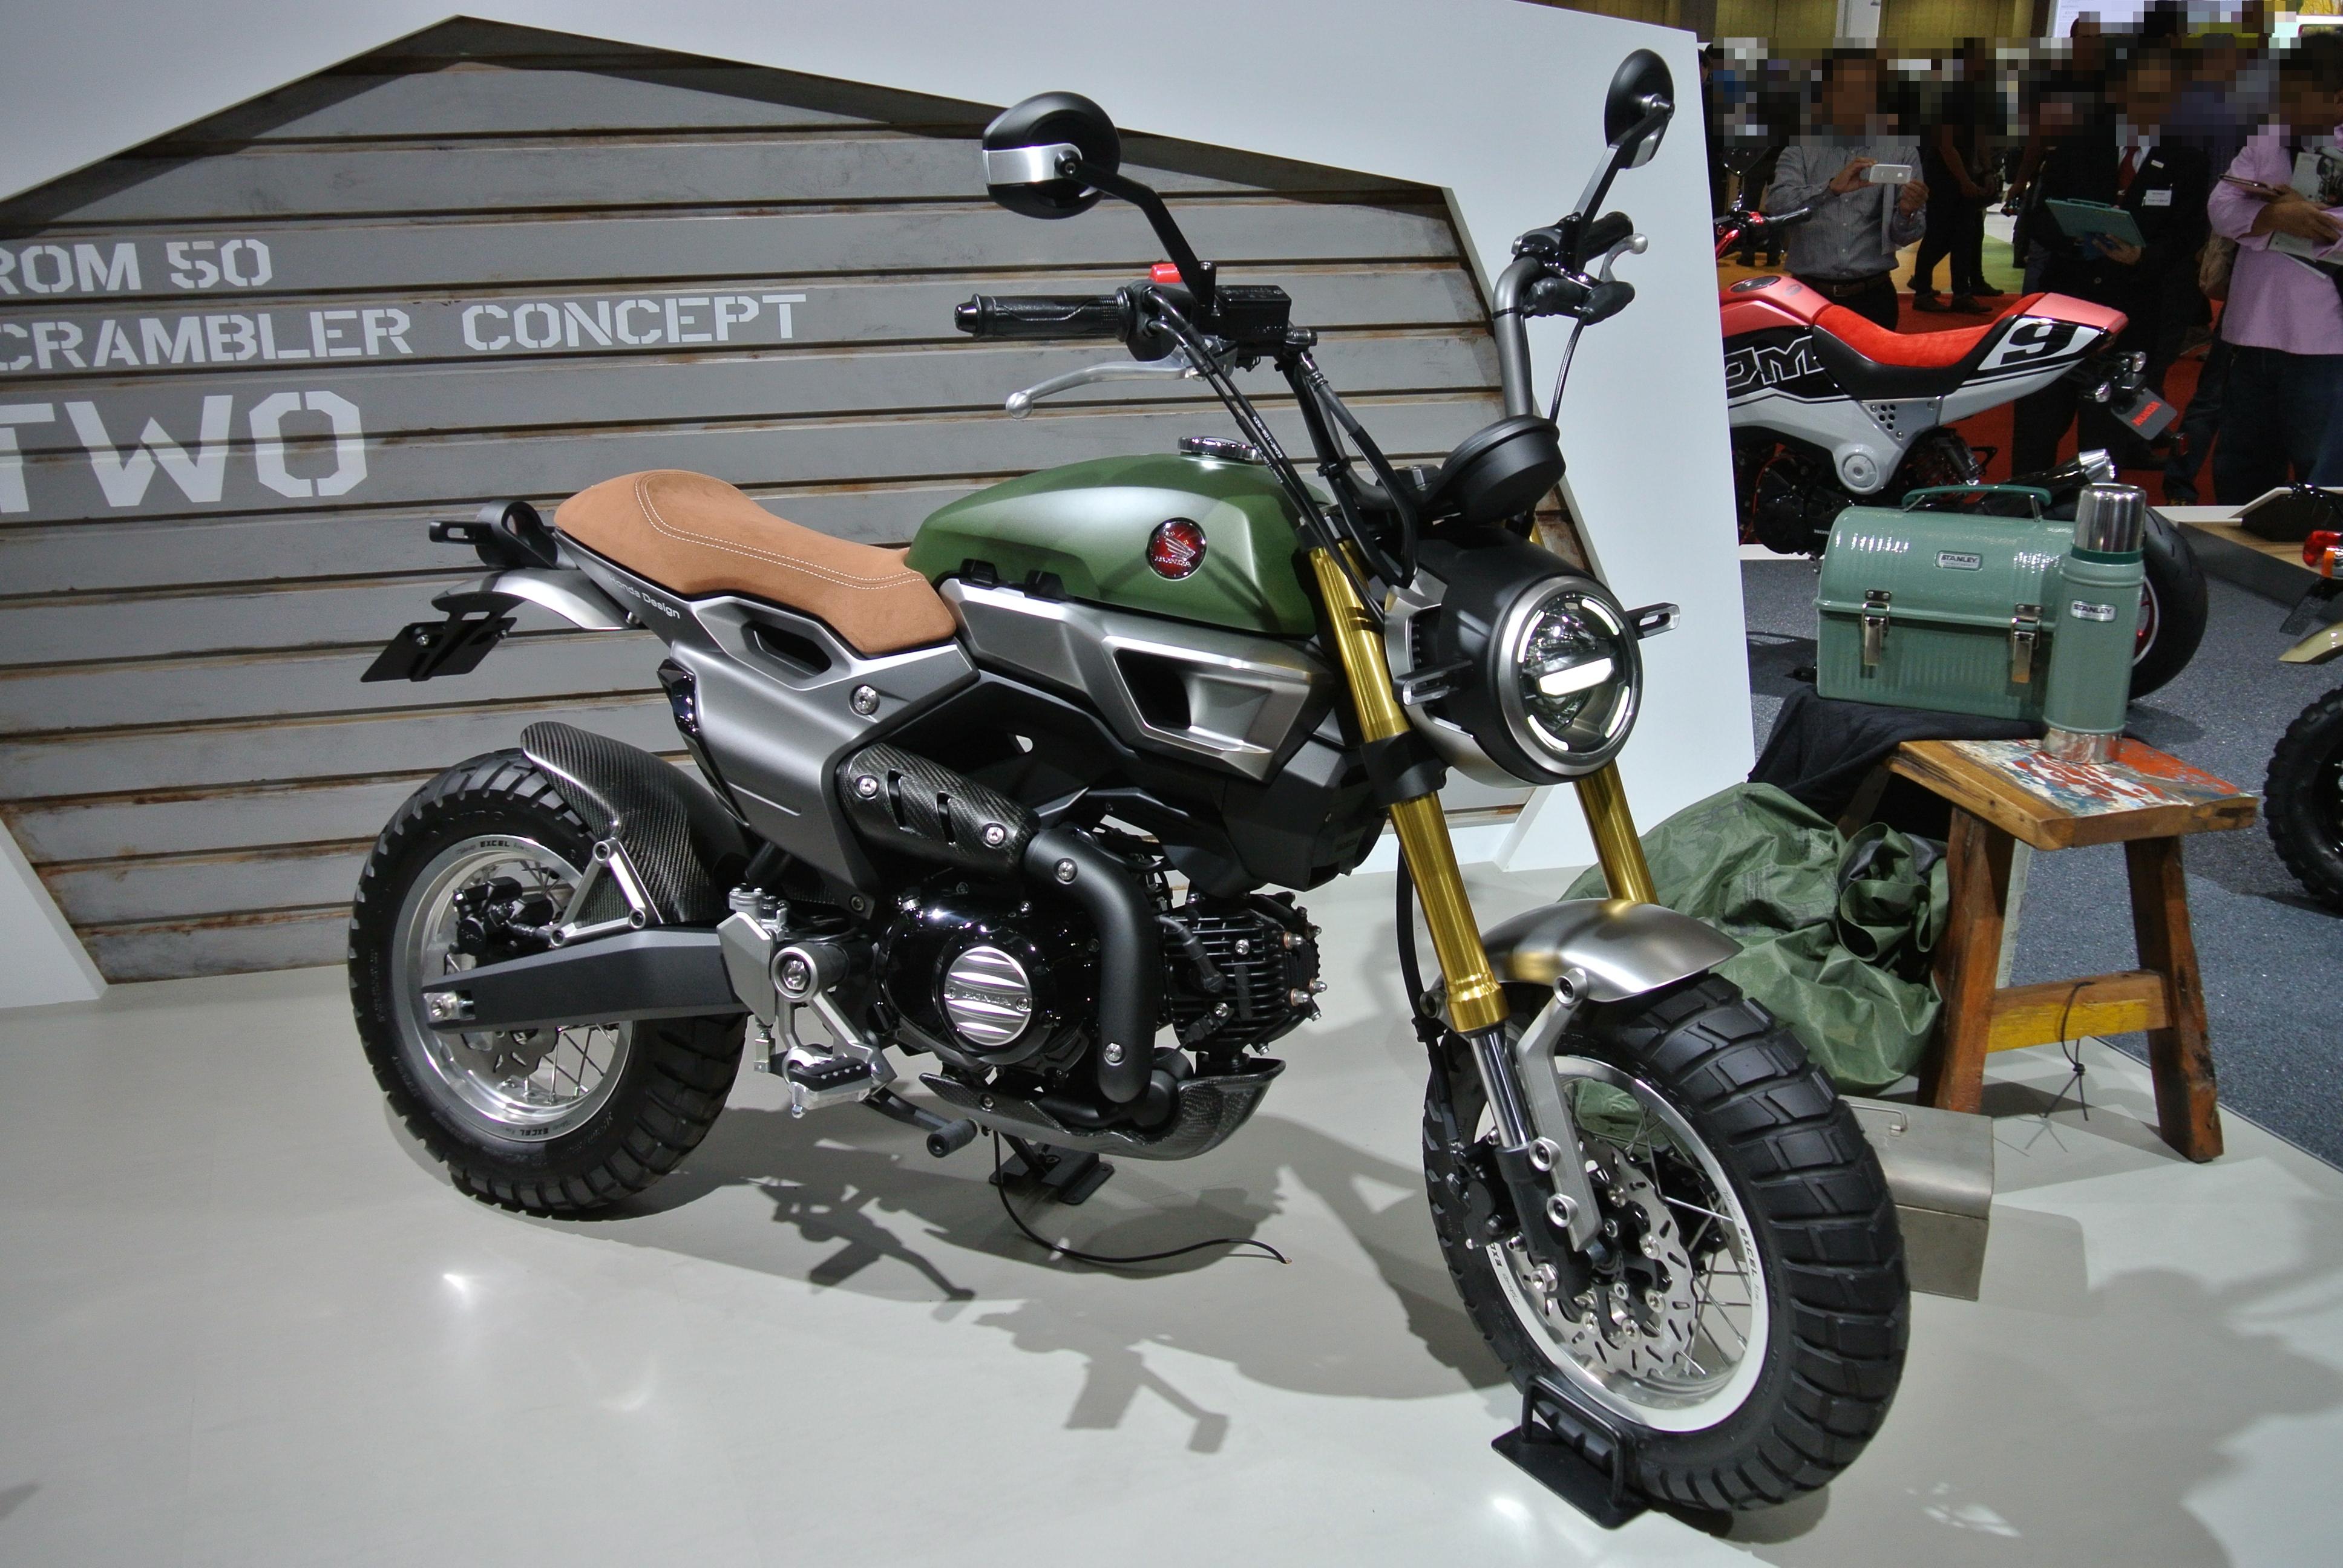 Build Your Own Honda Grom >> File:Honda concept grom 50 two.JPG - Wikimedia Commons